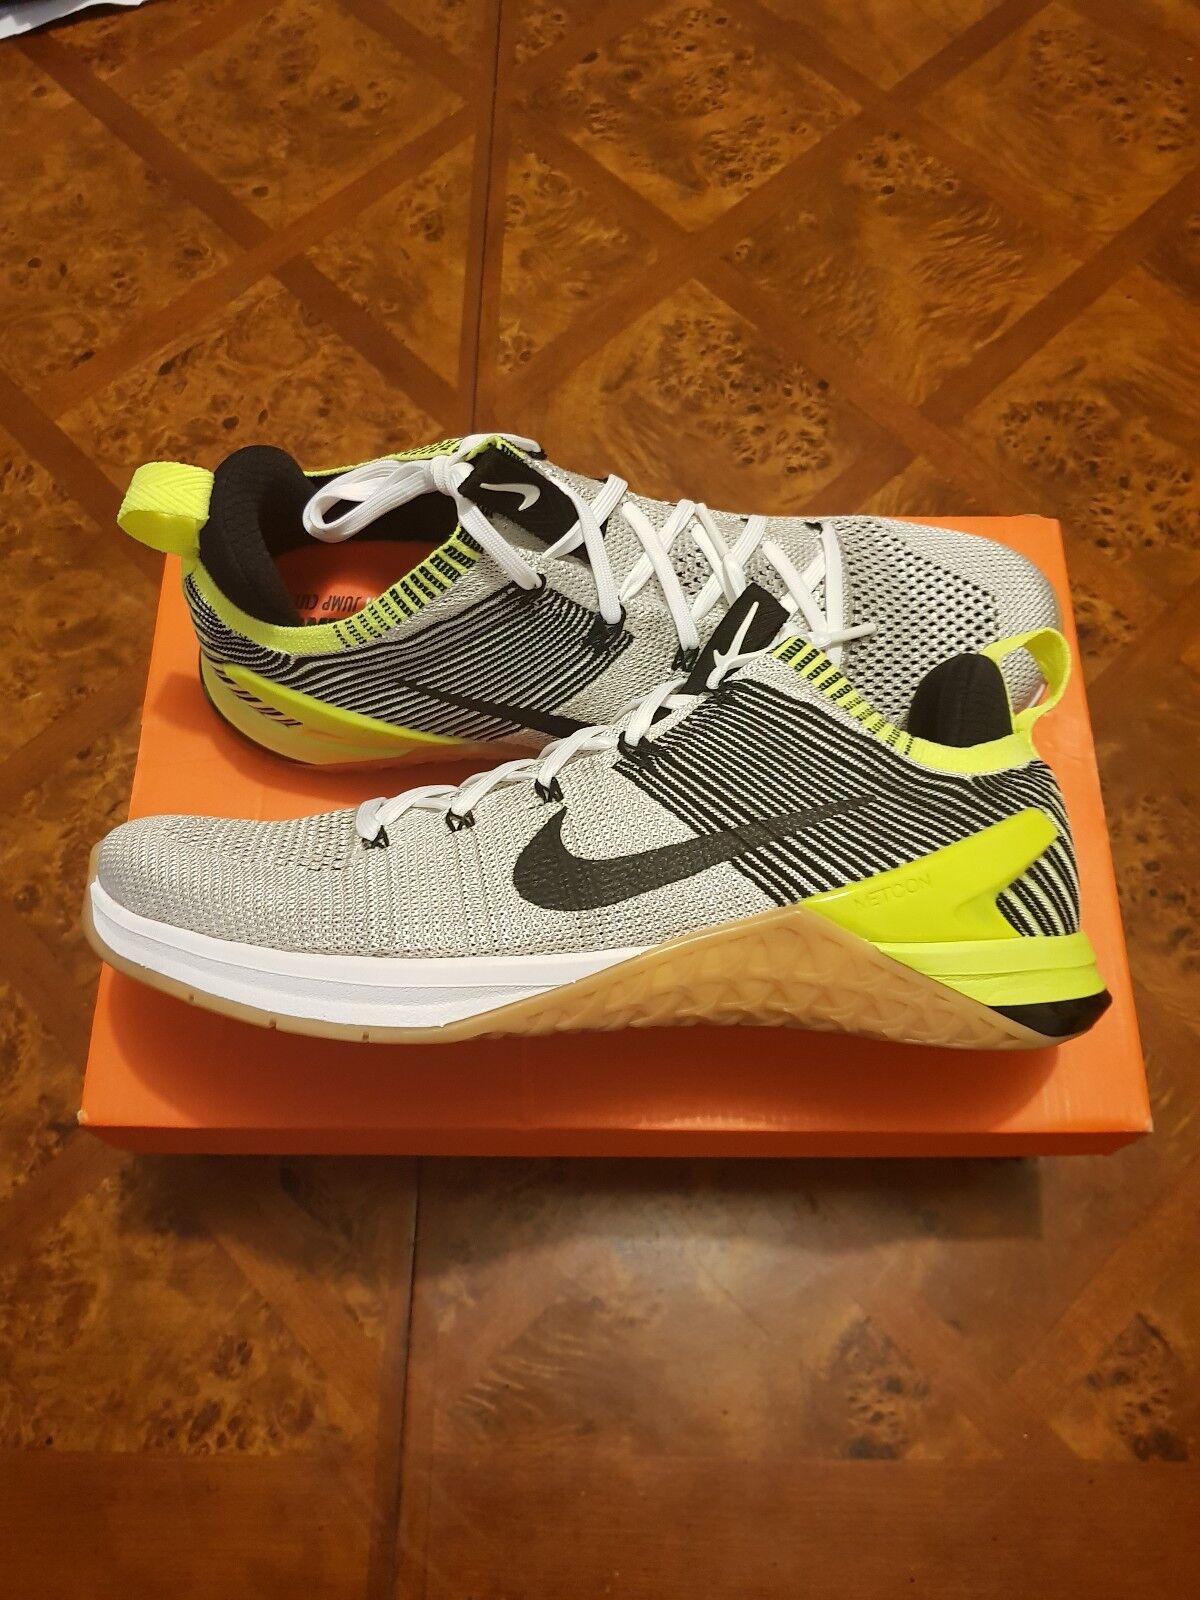 Nike Metcon DSX Flyknit 2 MENS Training White Black 924423-107 sz 11.5 New